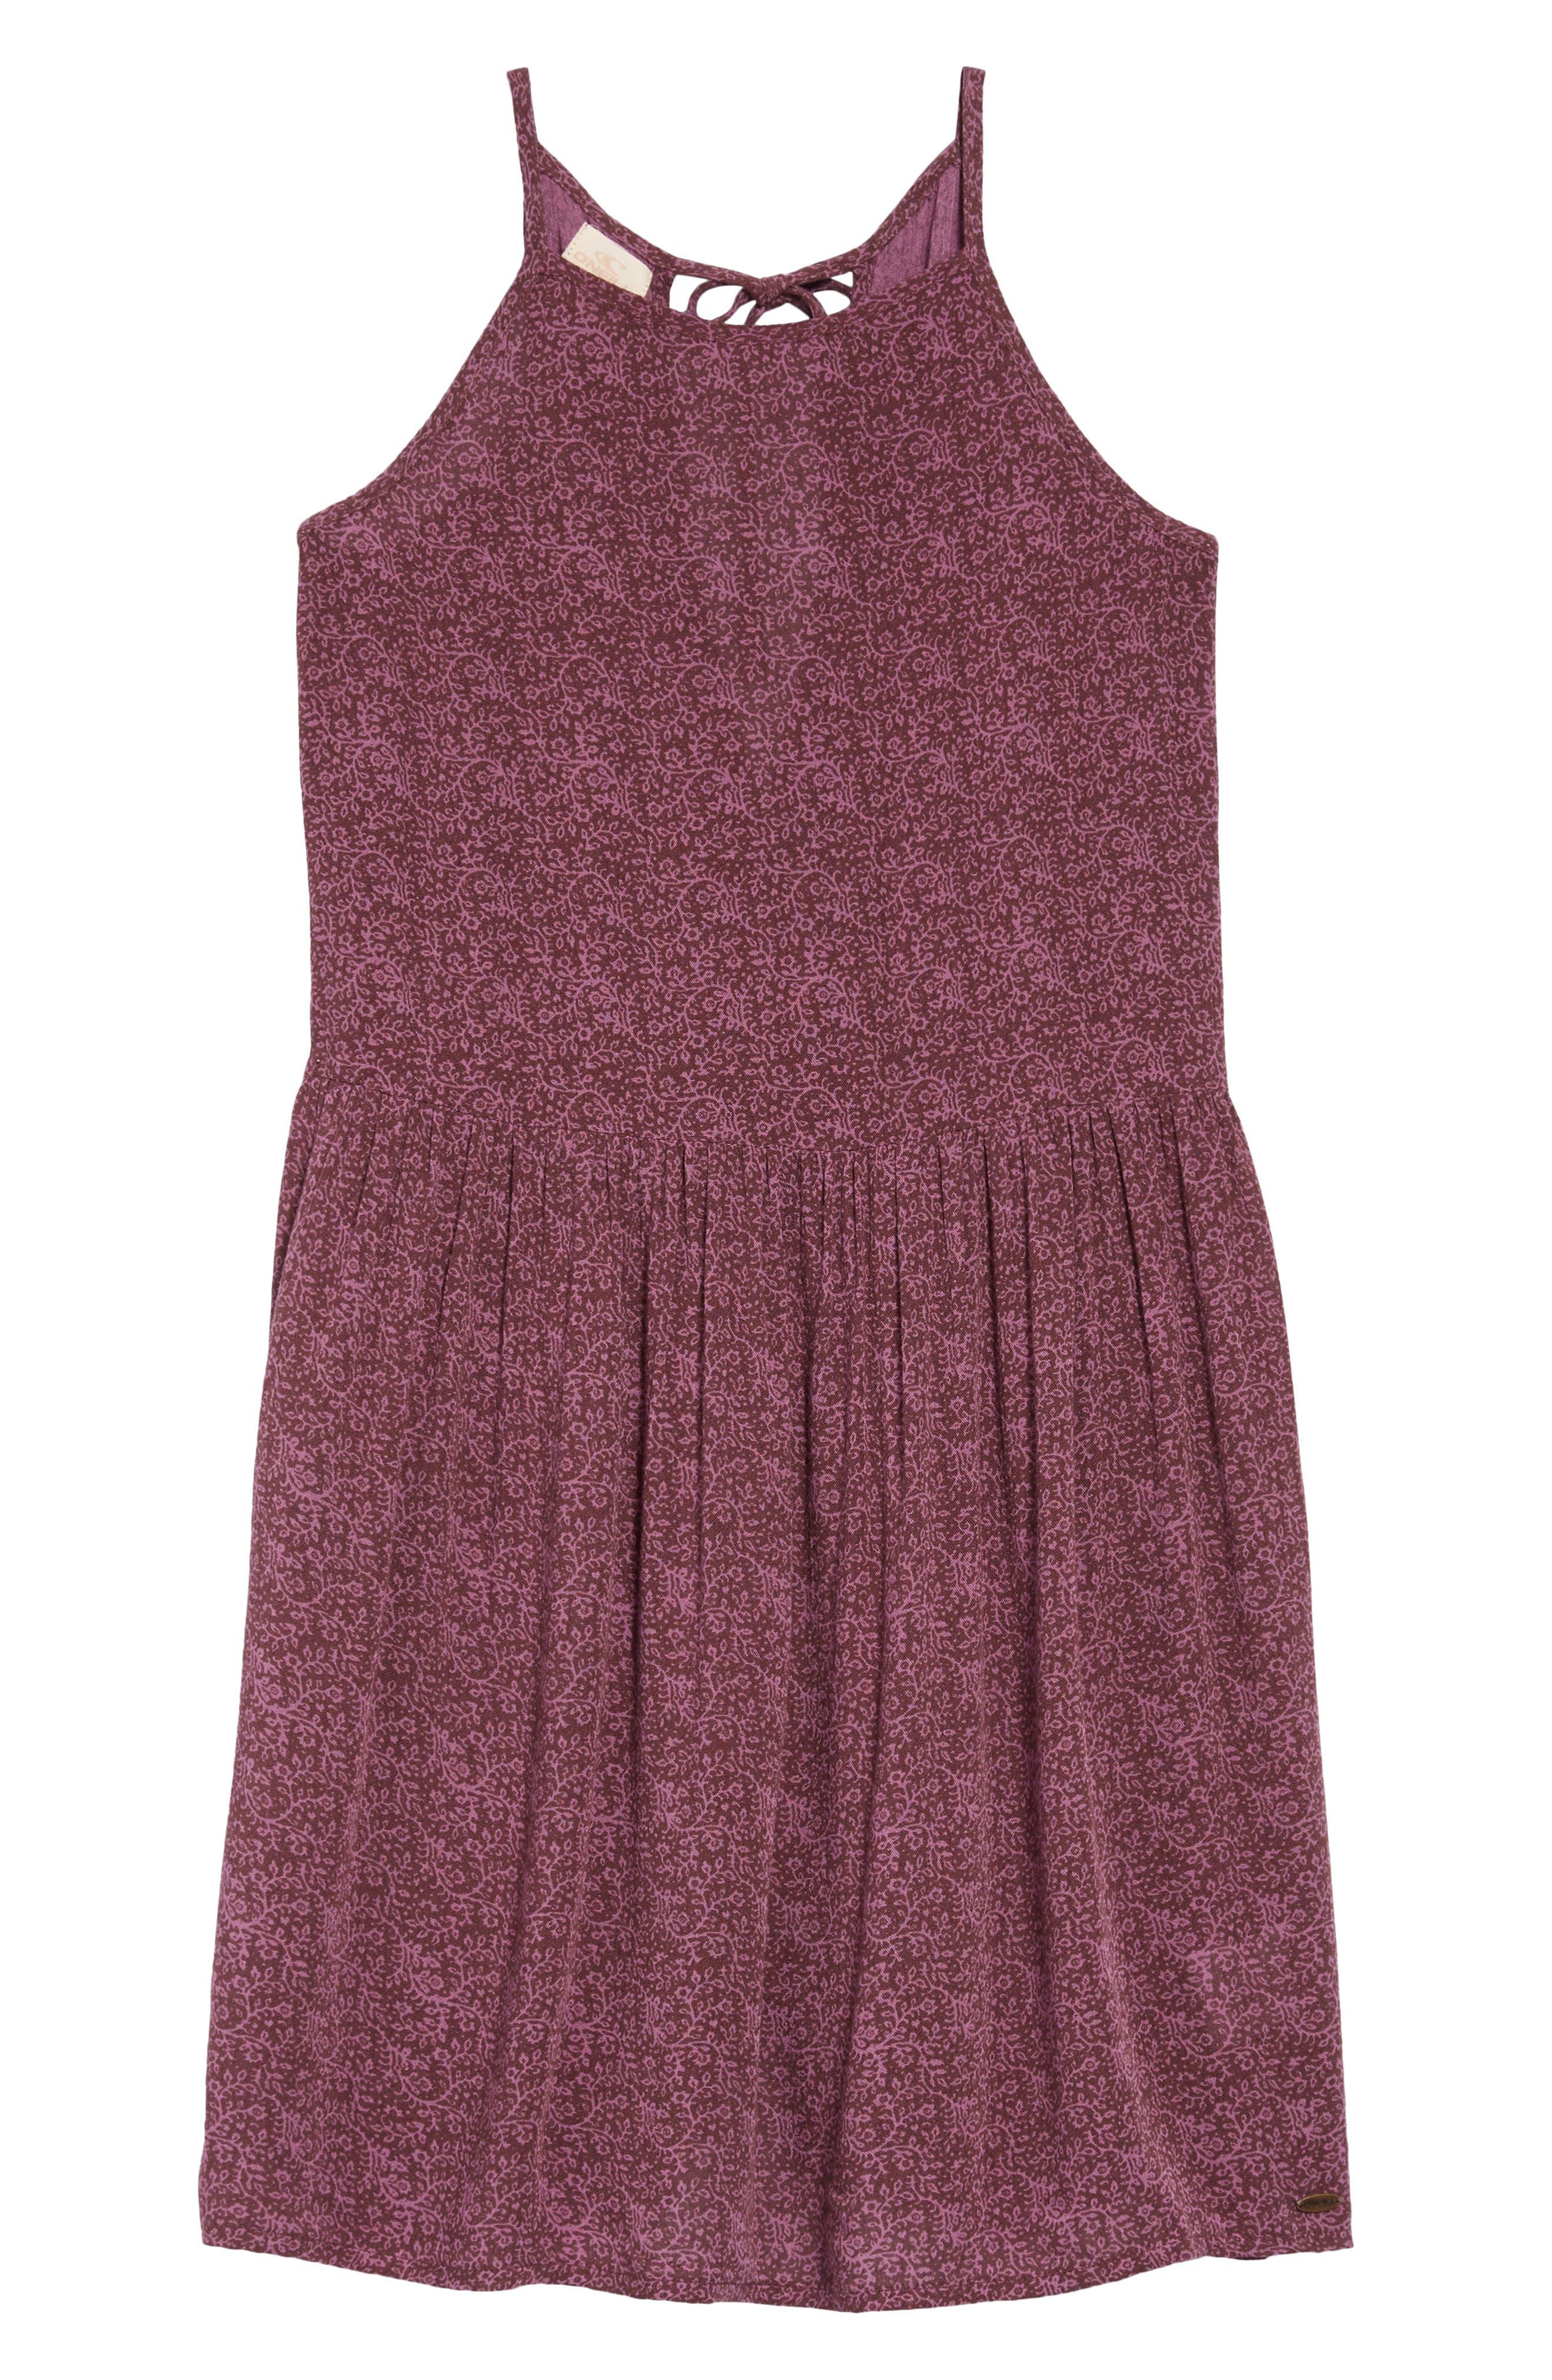 Shadowplay Halter Dress,                         Main,                         color, 200